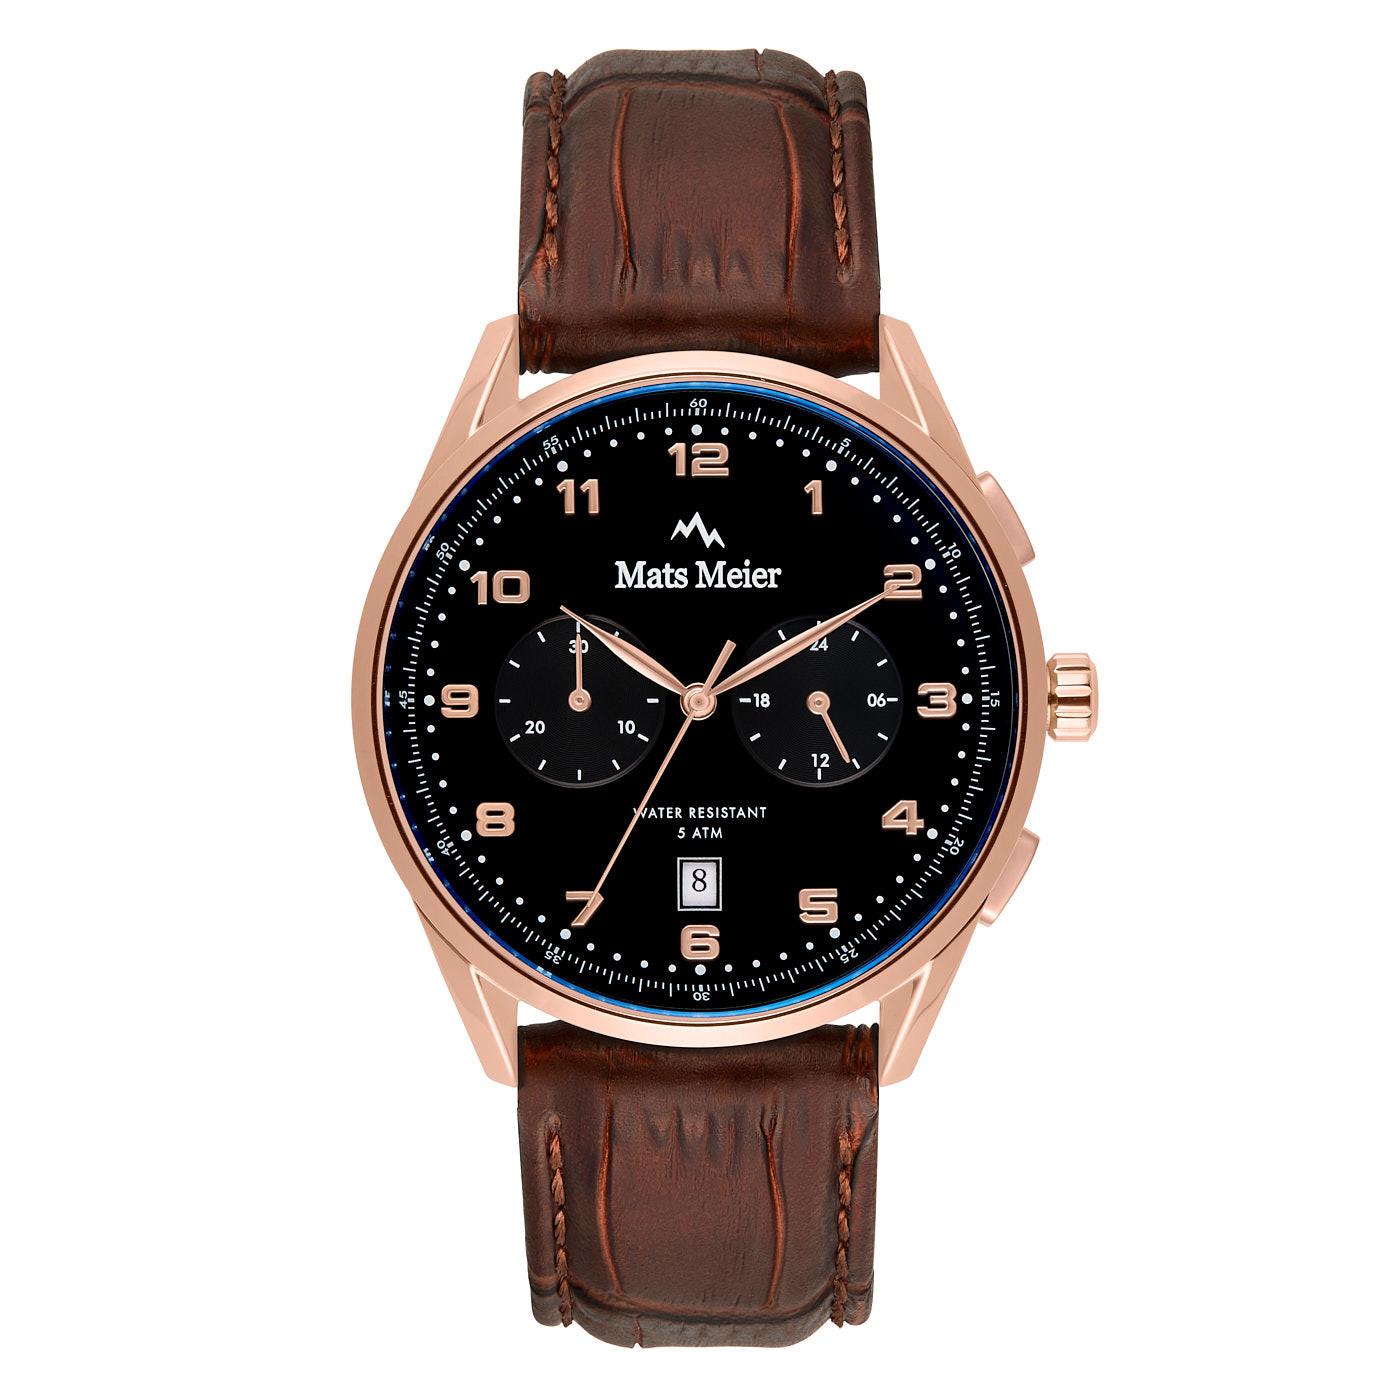 Mats Meier Mont Vélan chronograph watch black/rosé/brown